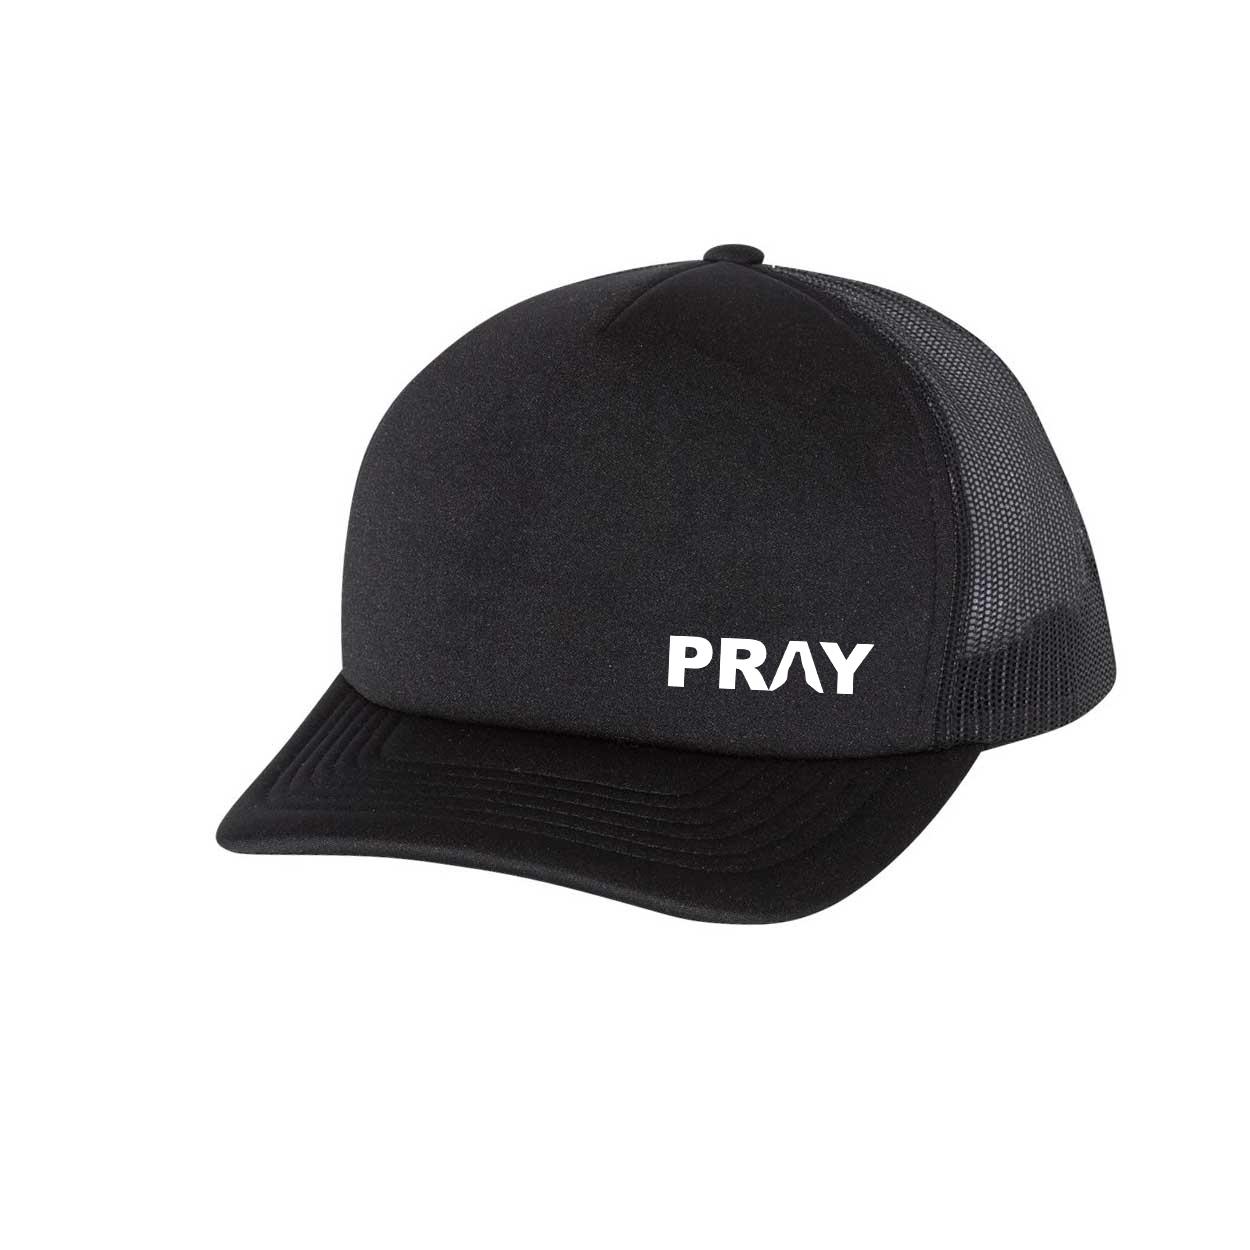 Pray Hands Logo Night Out Premium Foam Trucker Snapback Hat Black (White Logo)